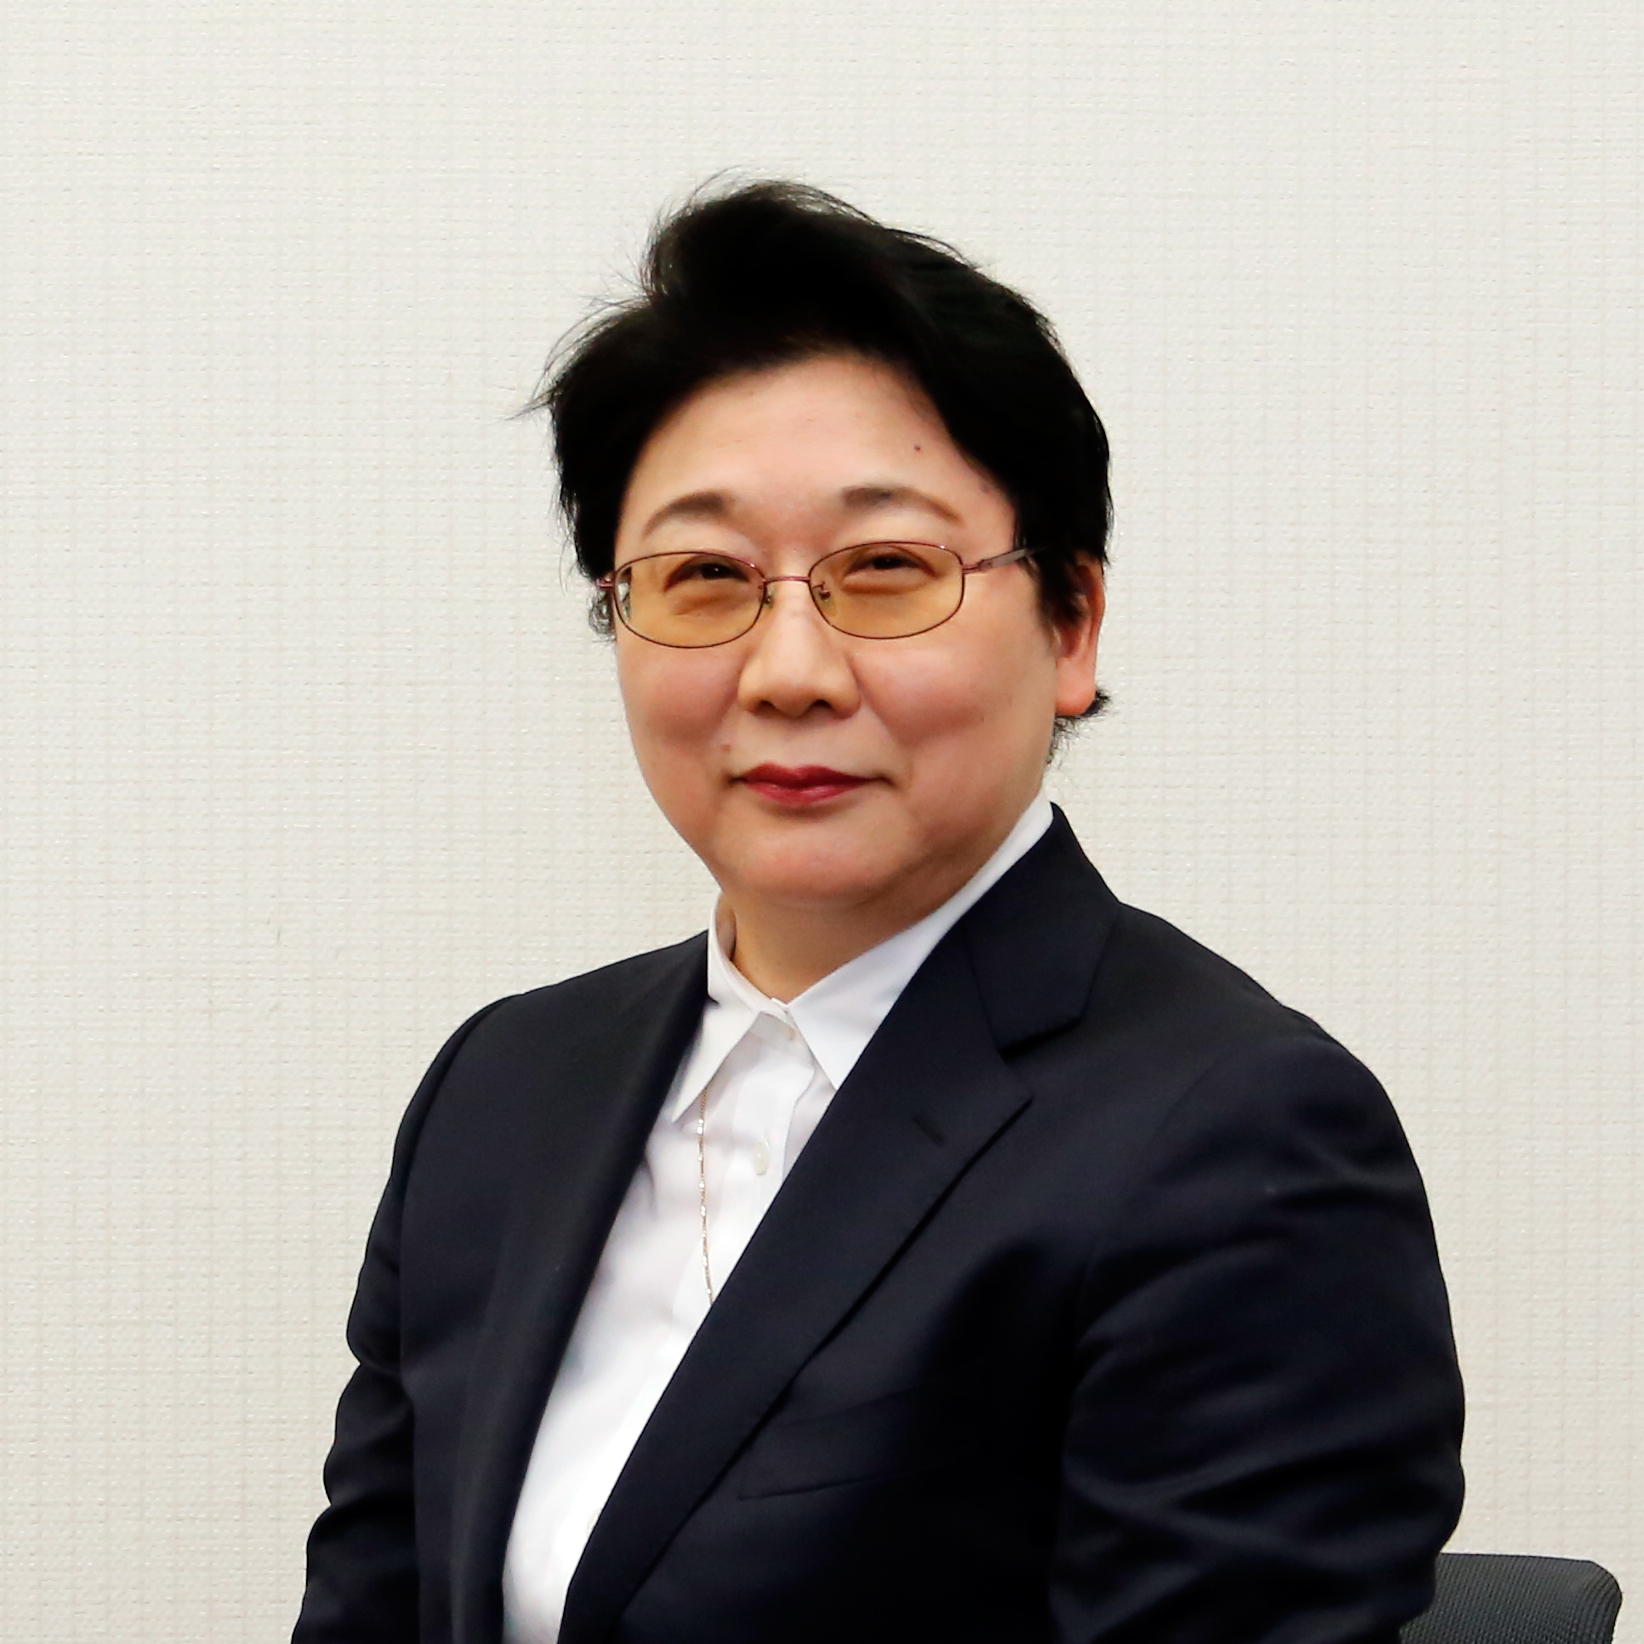 Hikari Nomura